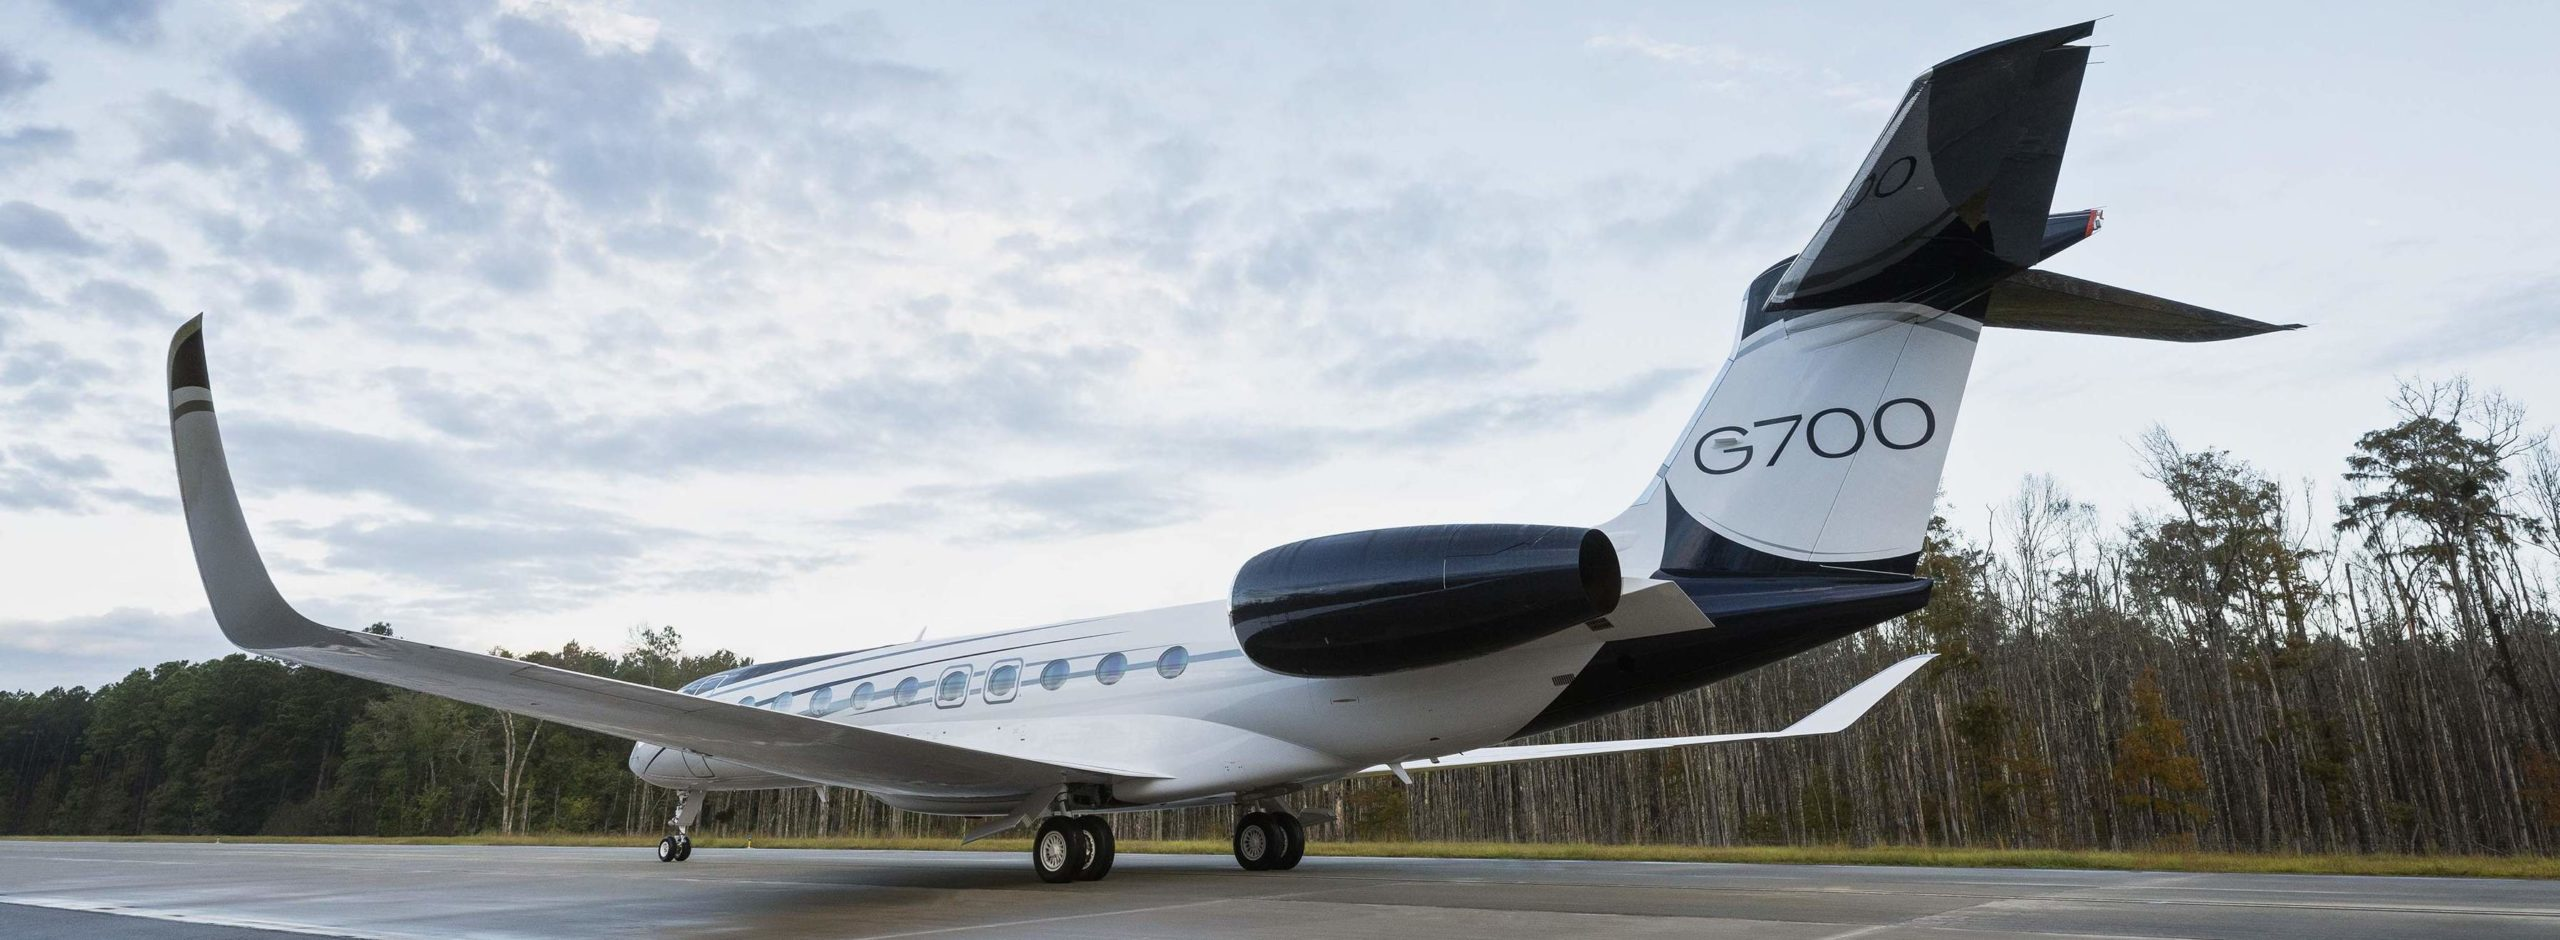 Jet privé Gulfstream G700 au roulage